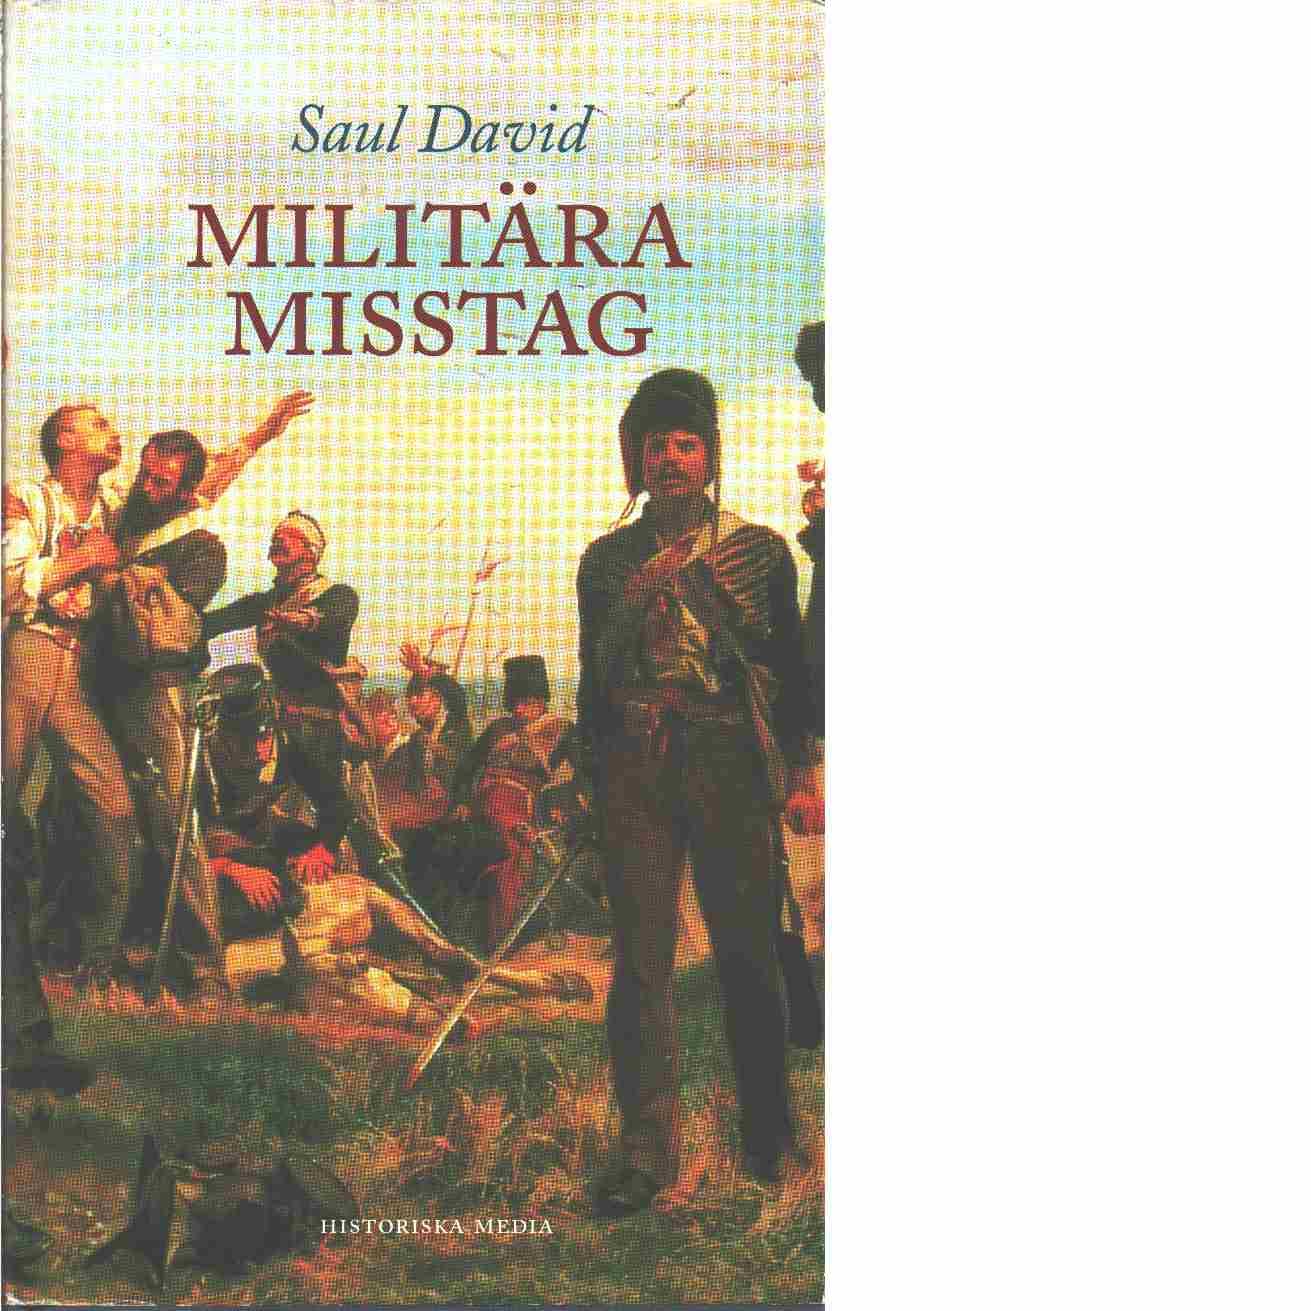 Militära misstag - David, Saul